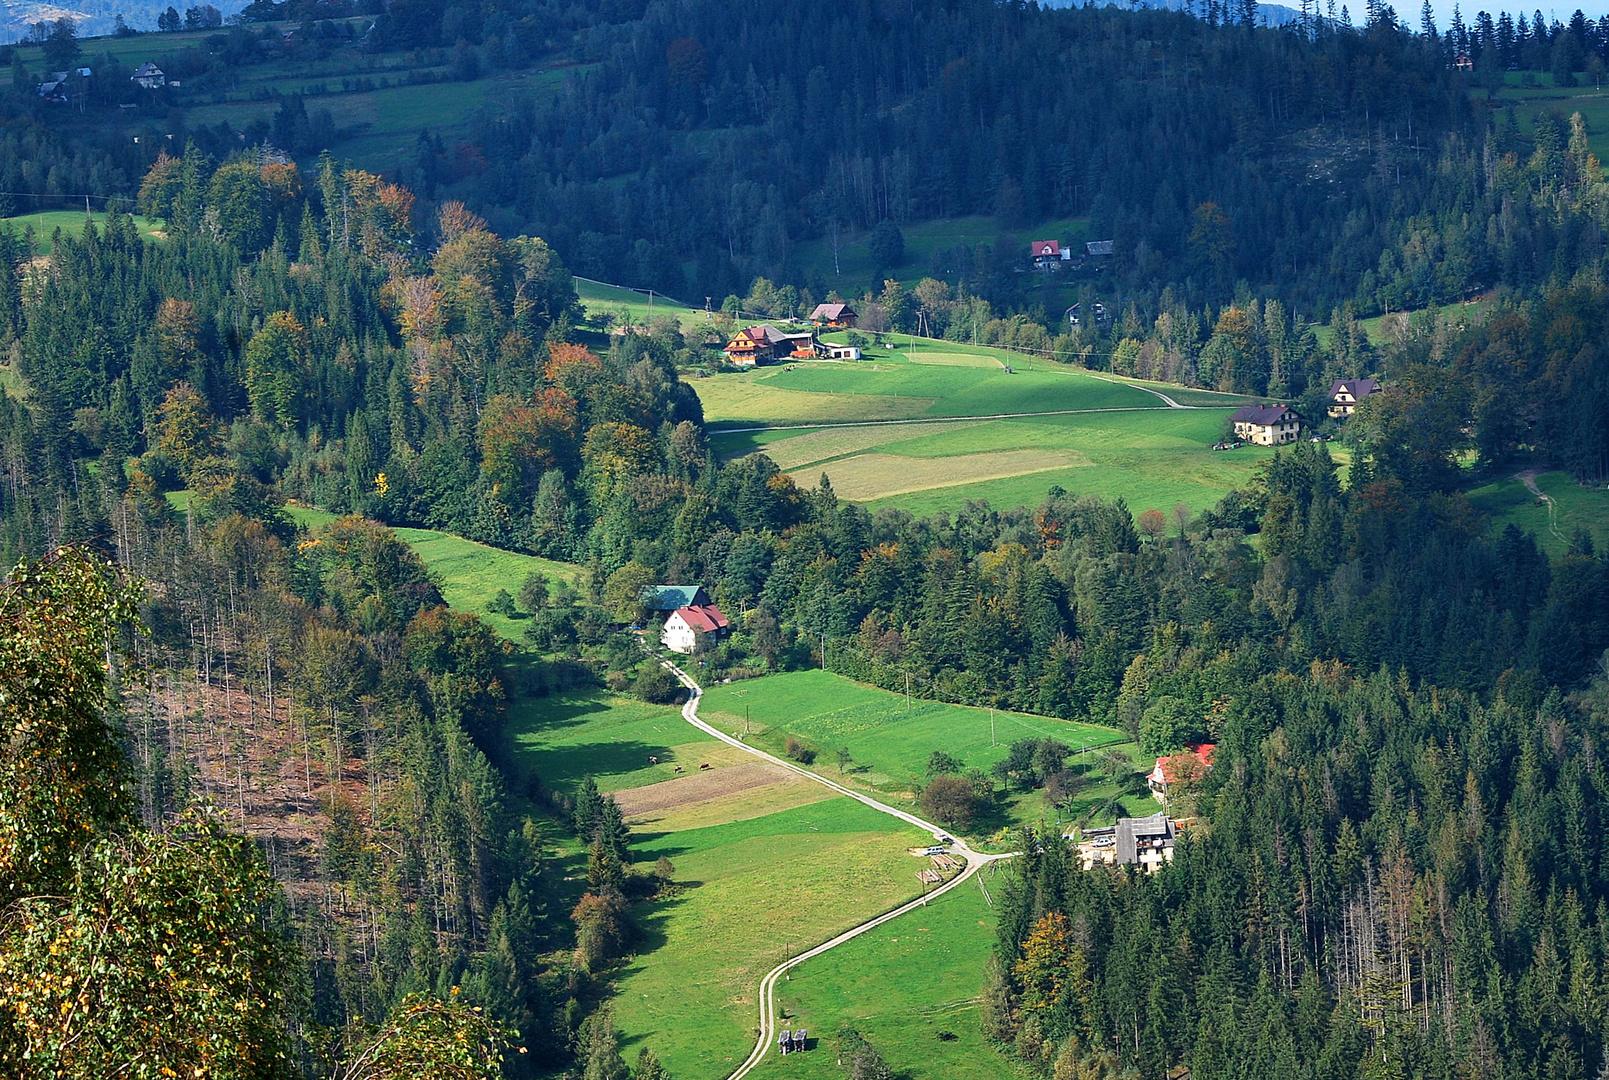 Kurviger Weg in Beskid Slaski (Polen)